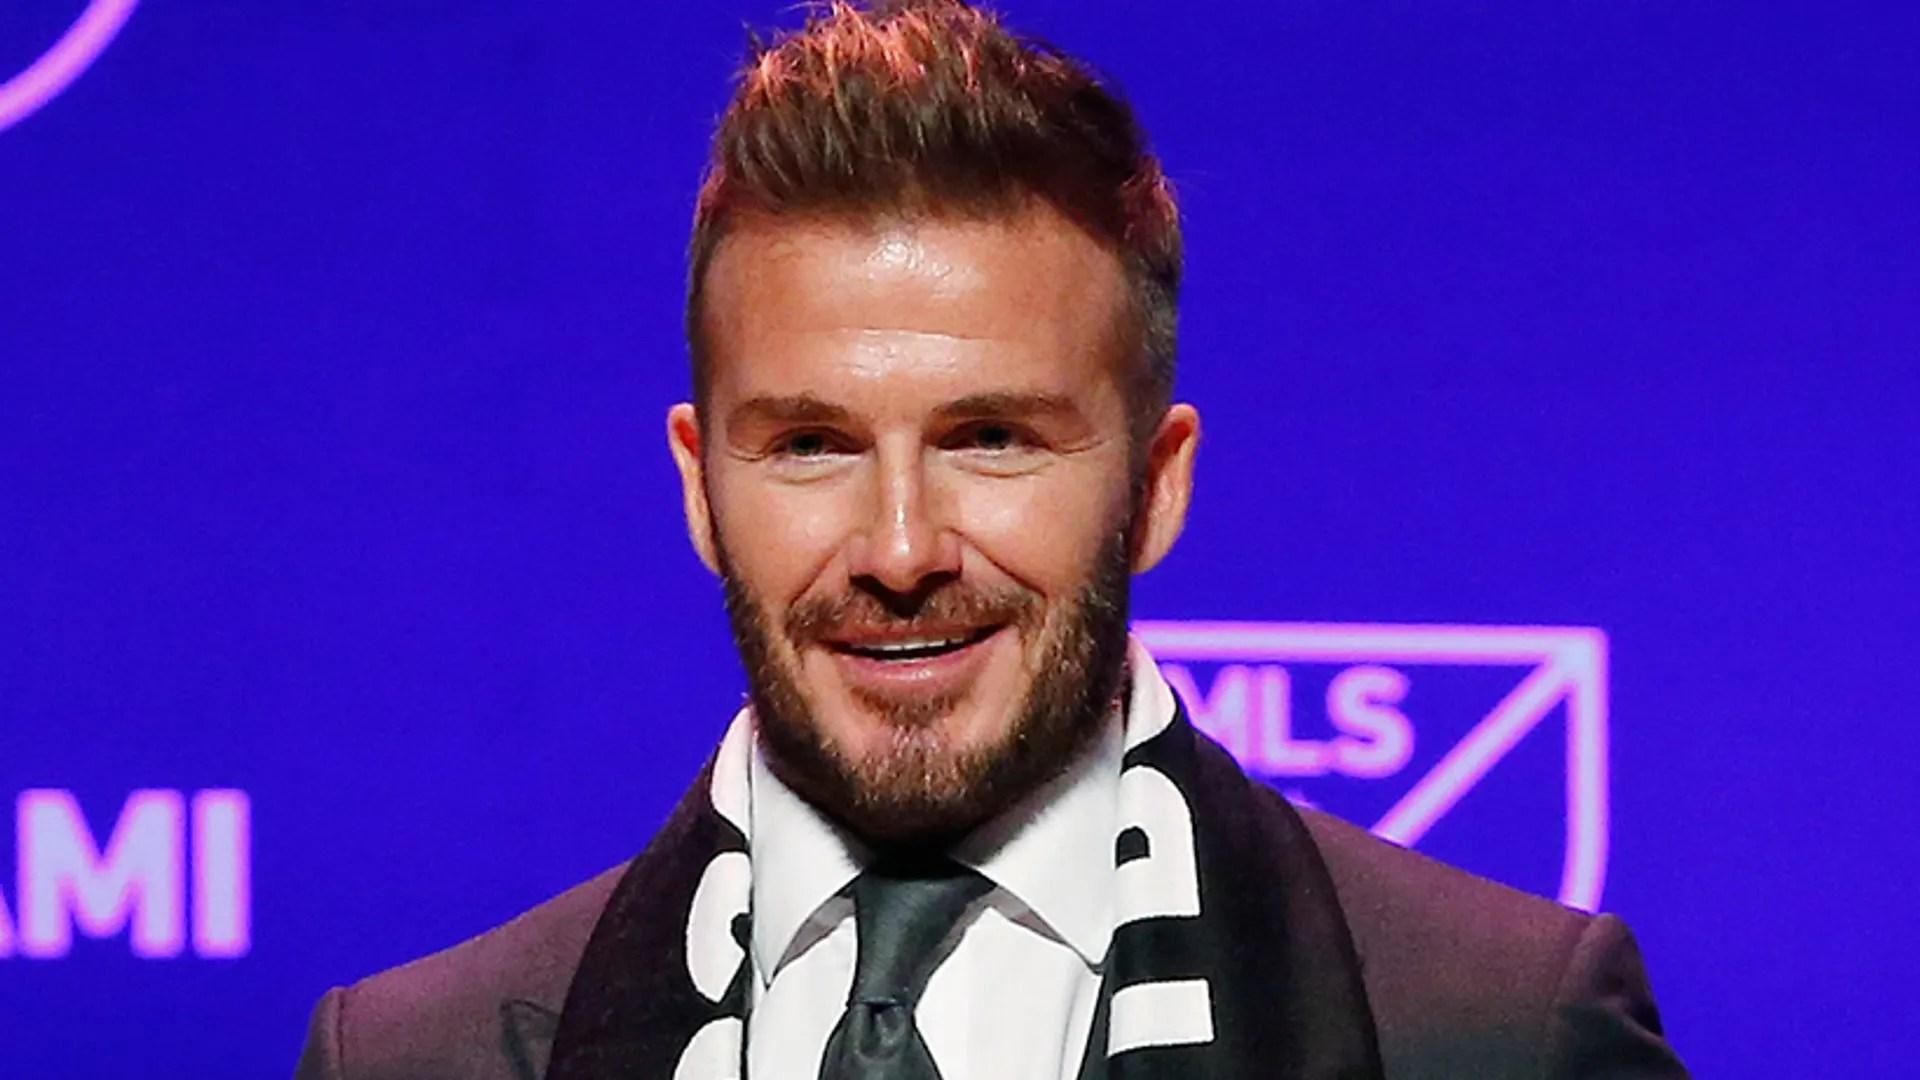 David Beckham New Haircut 2018 Haircuts Models Ideas